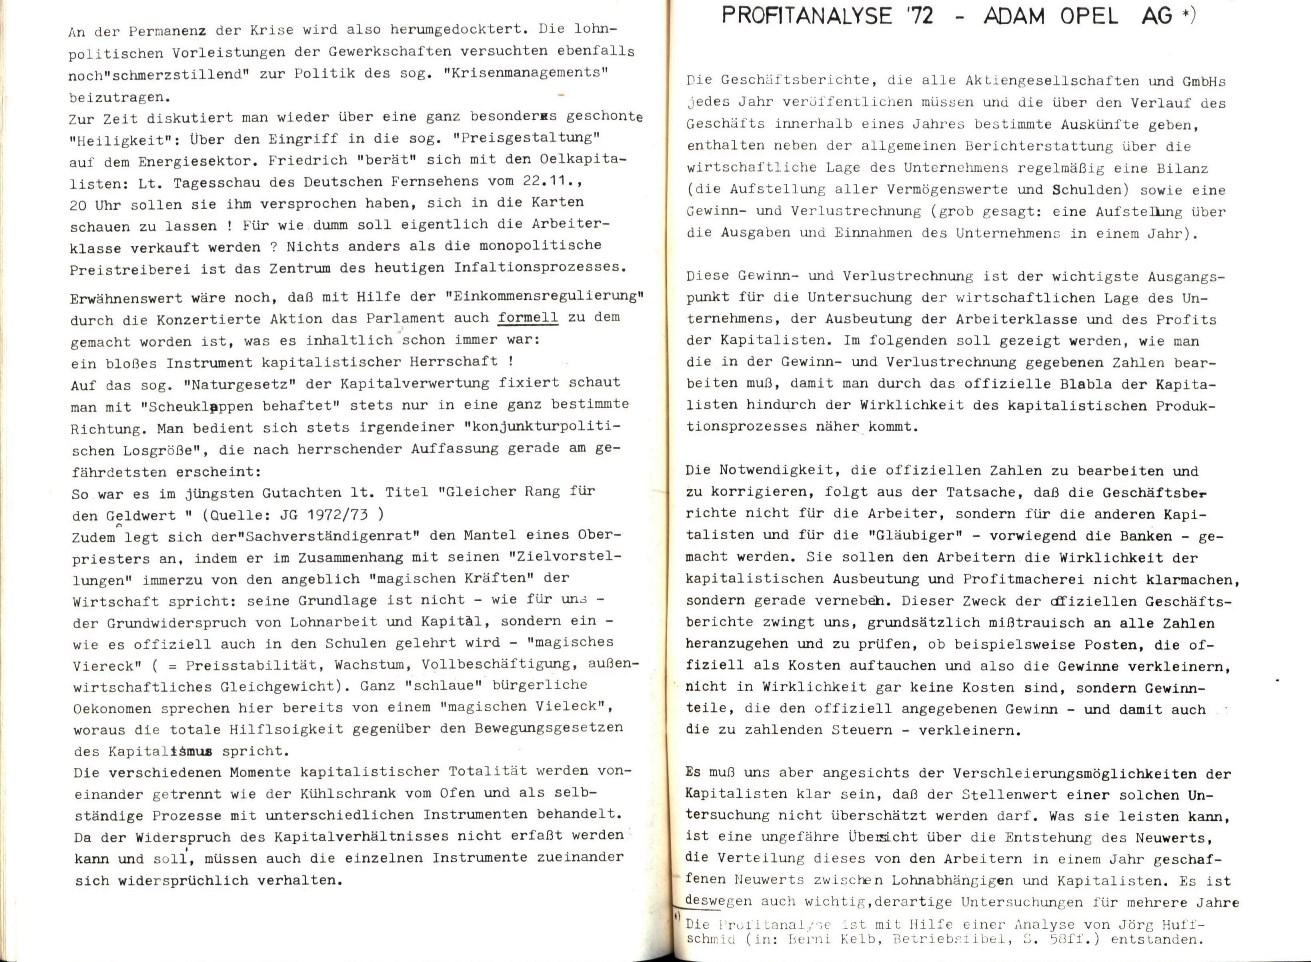 Bochum_IGM_Opel_PG_Opel_streikt_1973_085